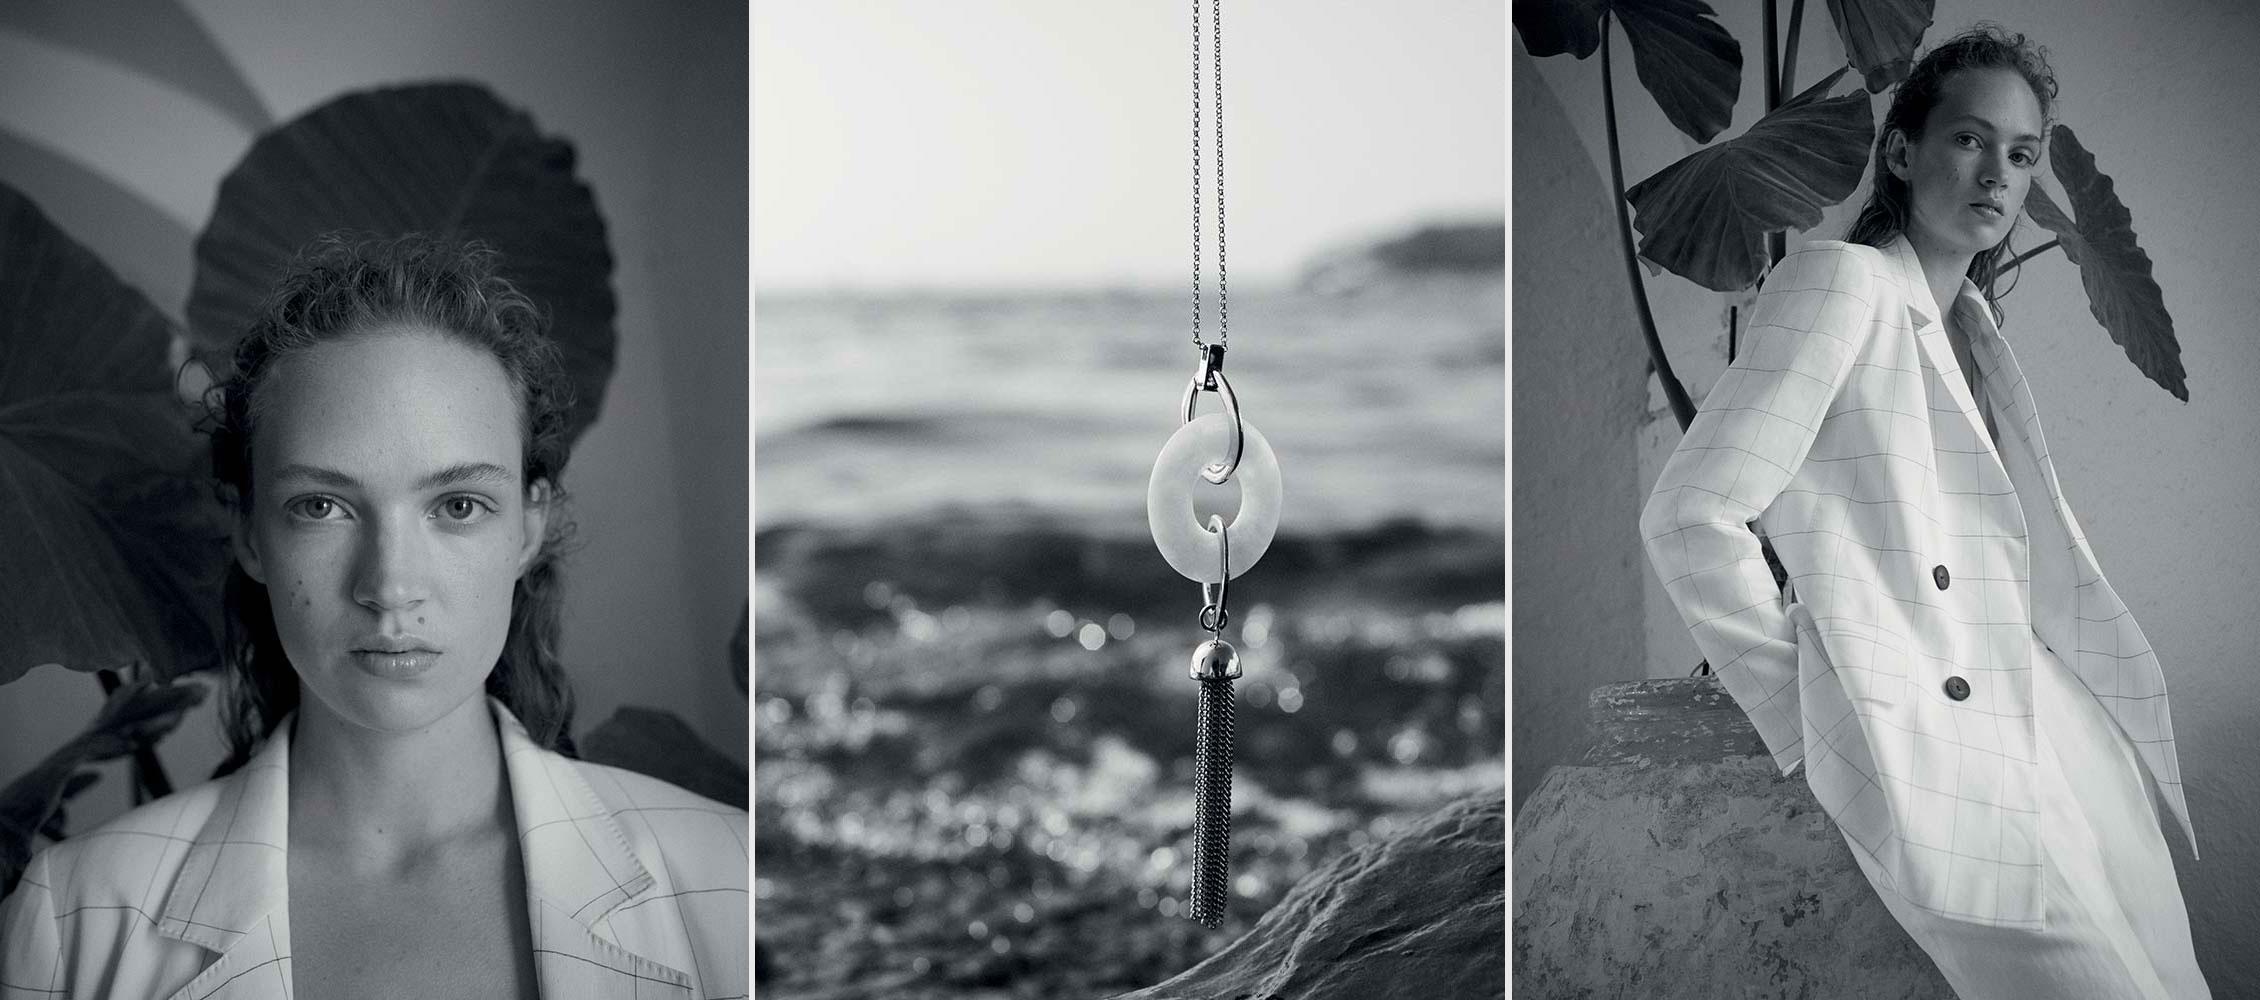 Massimo Dutti by Arno Frugier